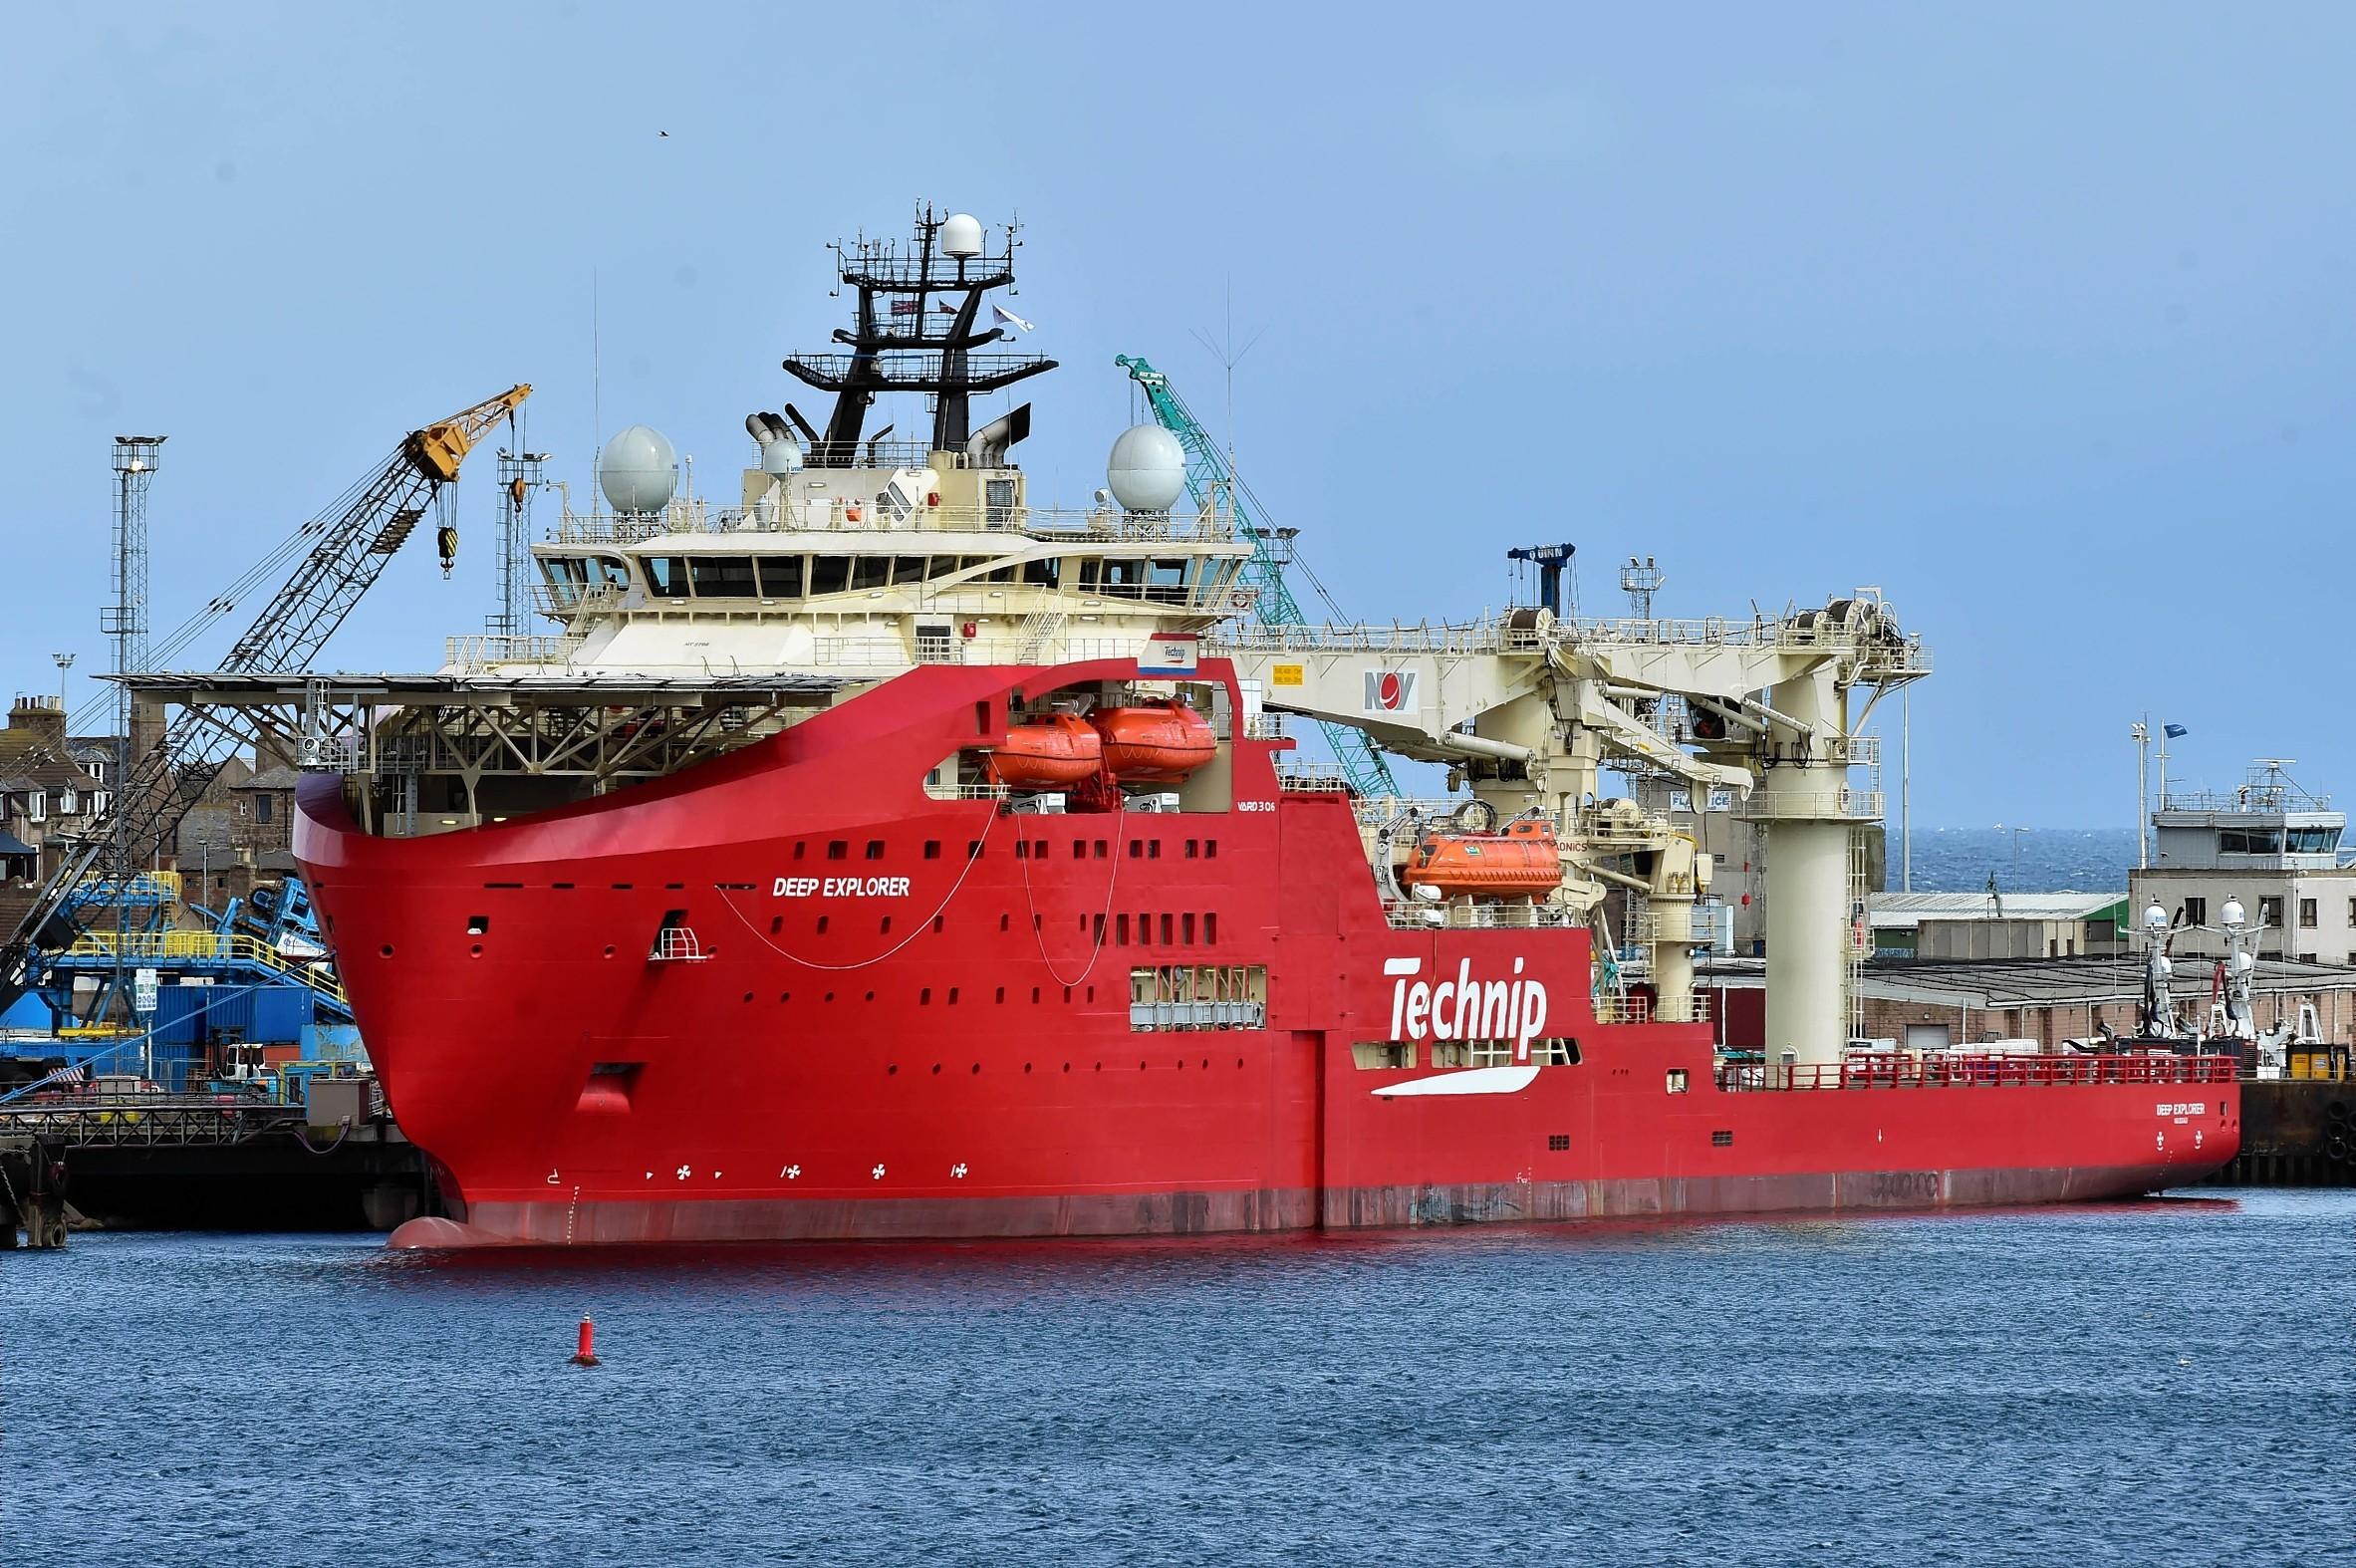 The Deep Explorer at Peterhead harbour